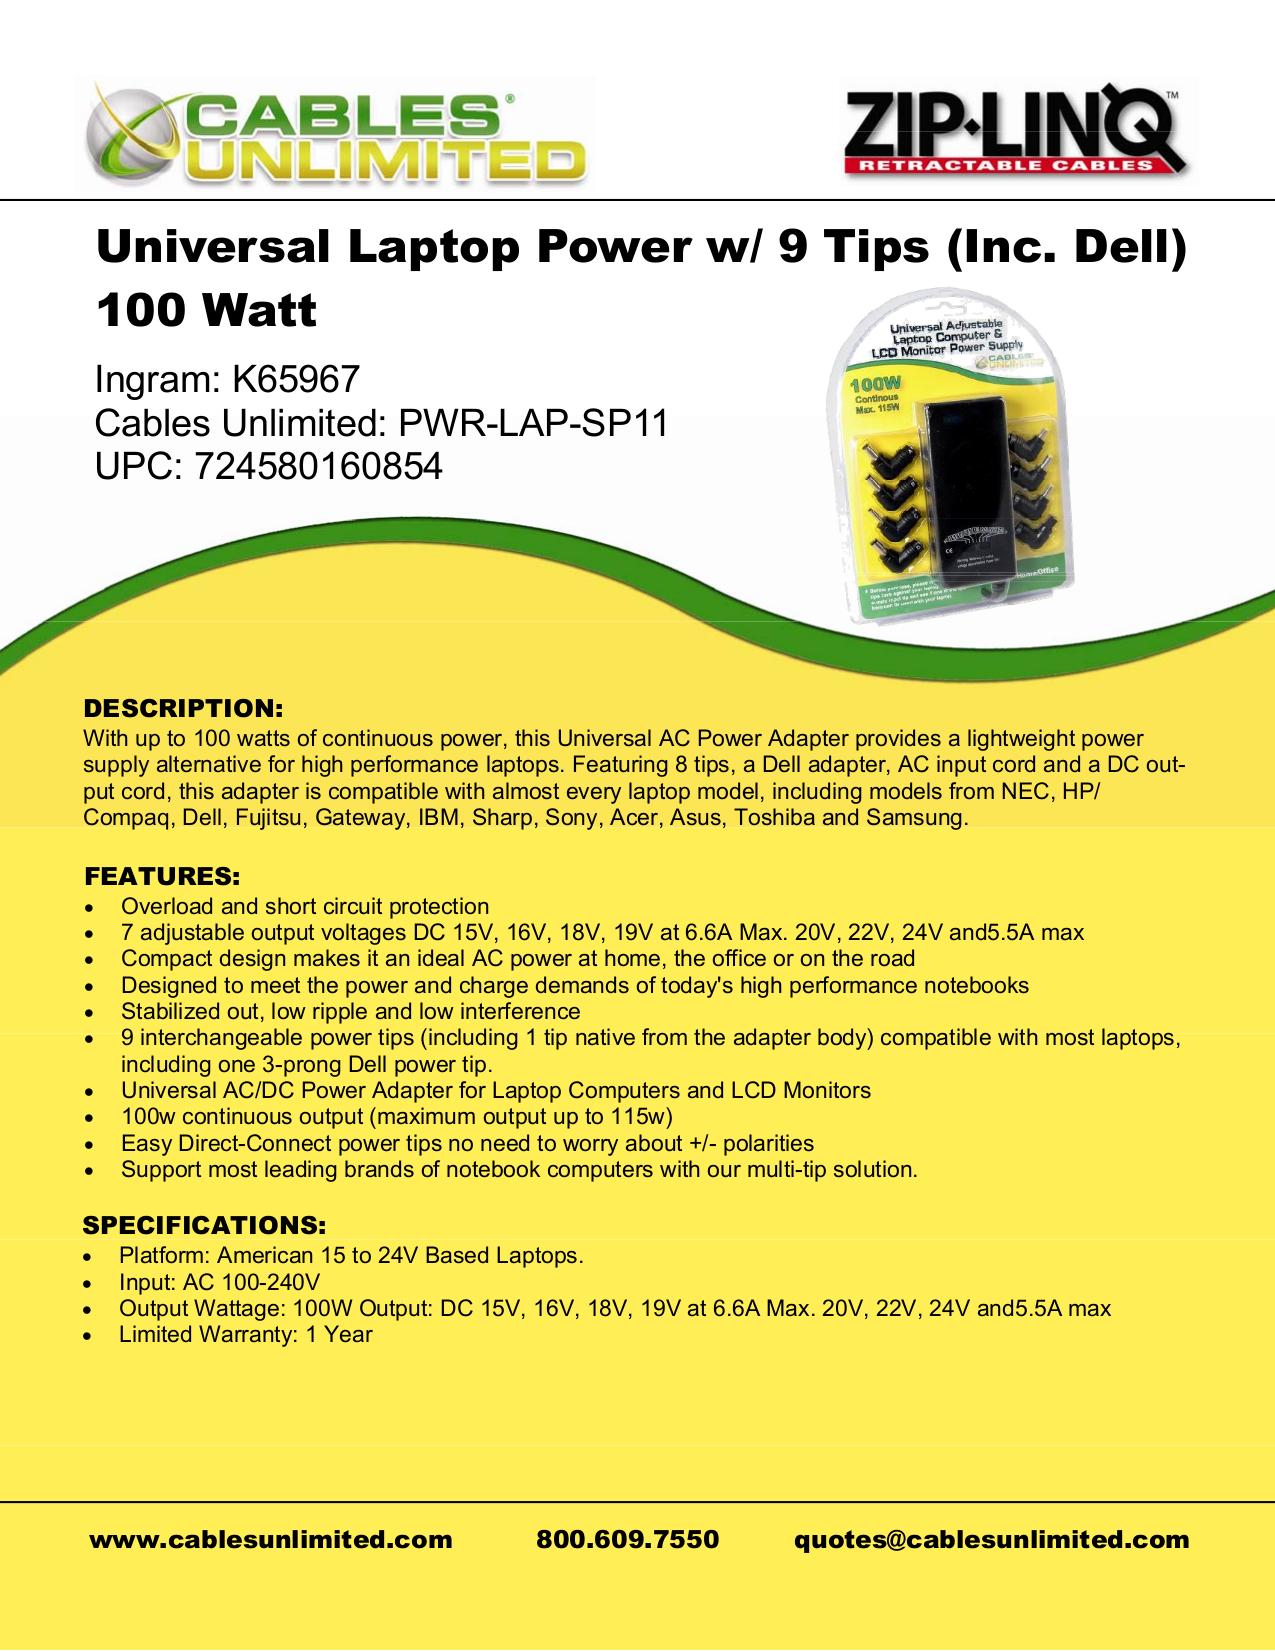 Download free pdf for Lenovo ThinkPad X61s 7668 Laptop manual